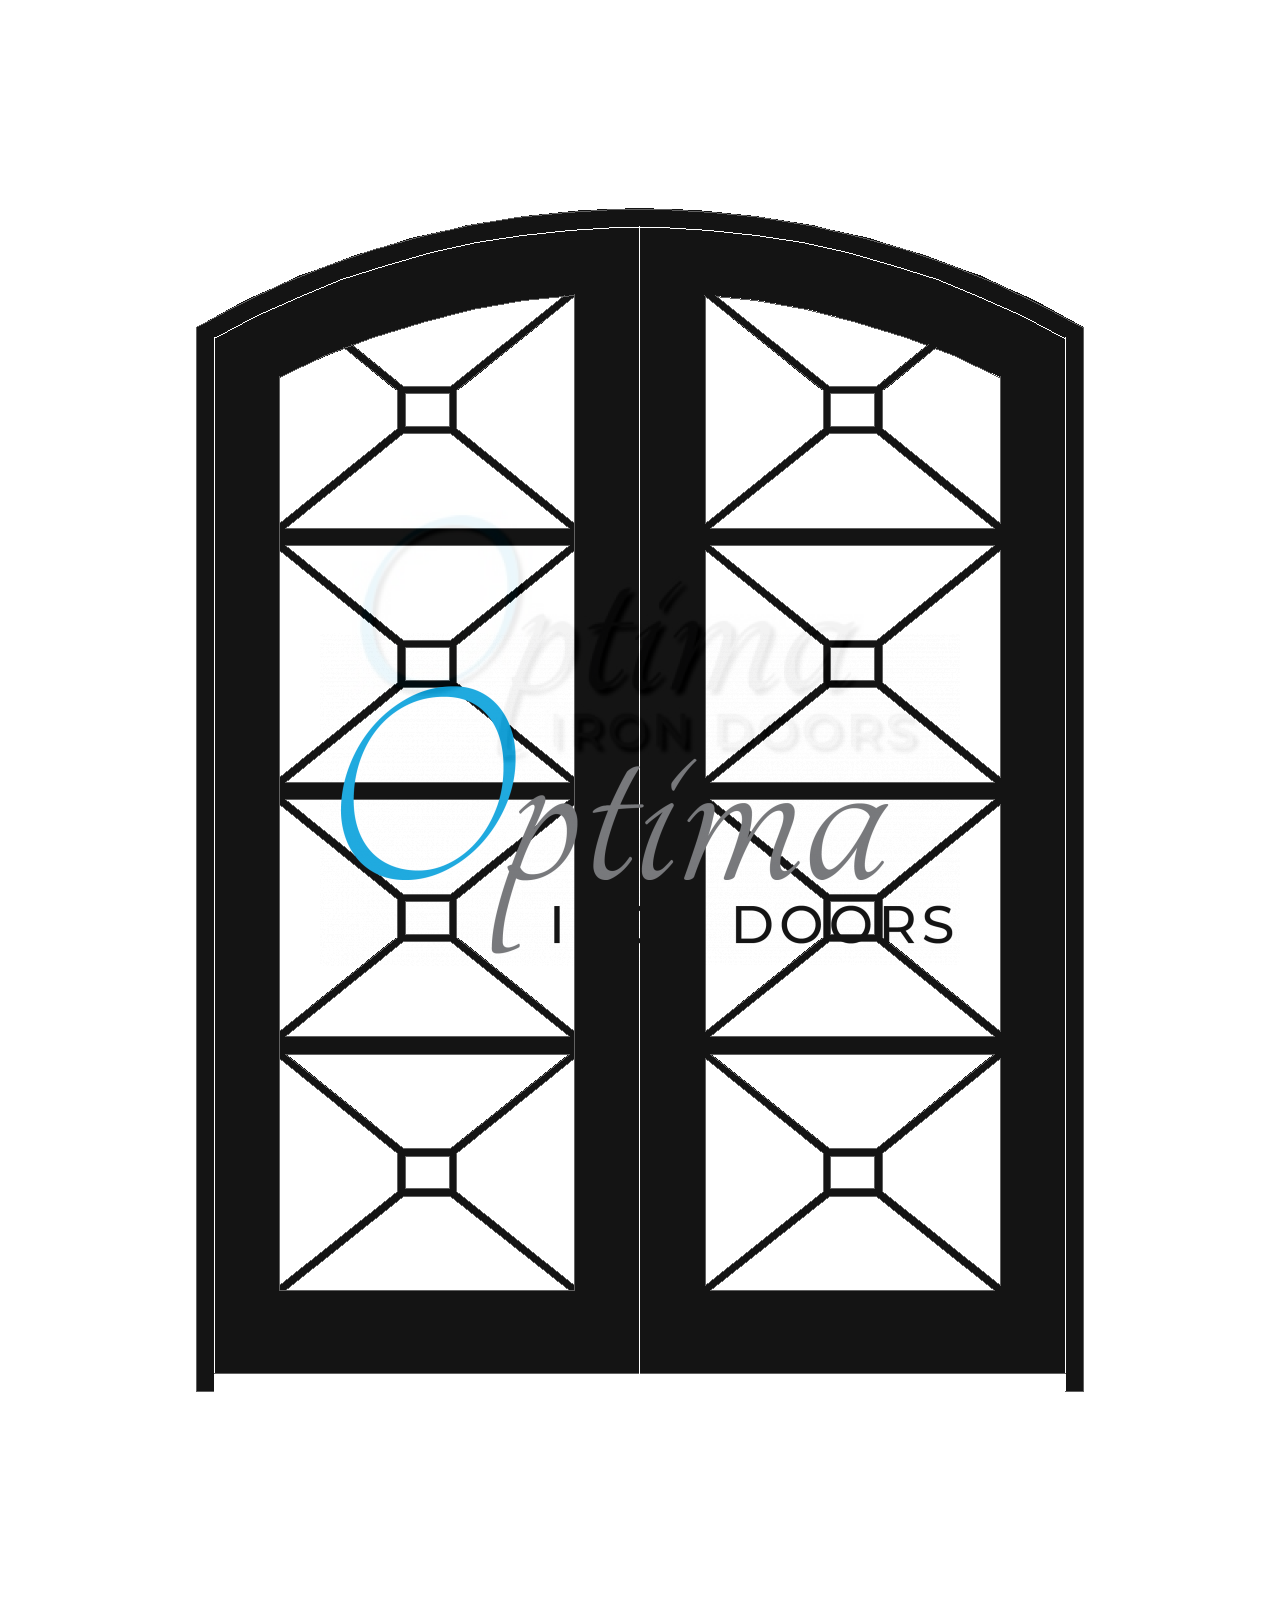 Standard Profile Arch Top Full Lite Decorative Glass Double Iron Door - ITZA OID-6080-ITZAT